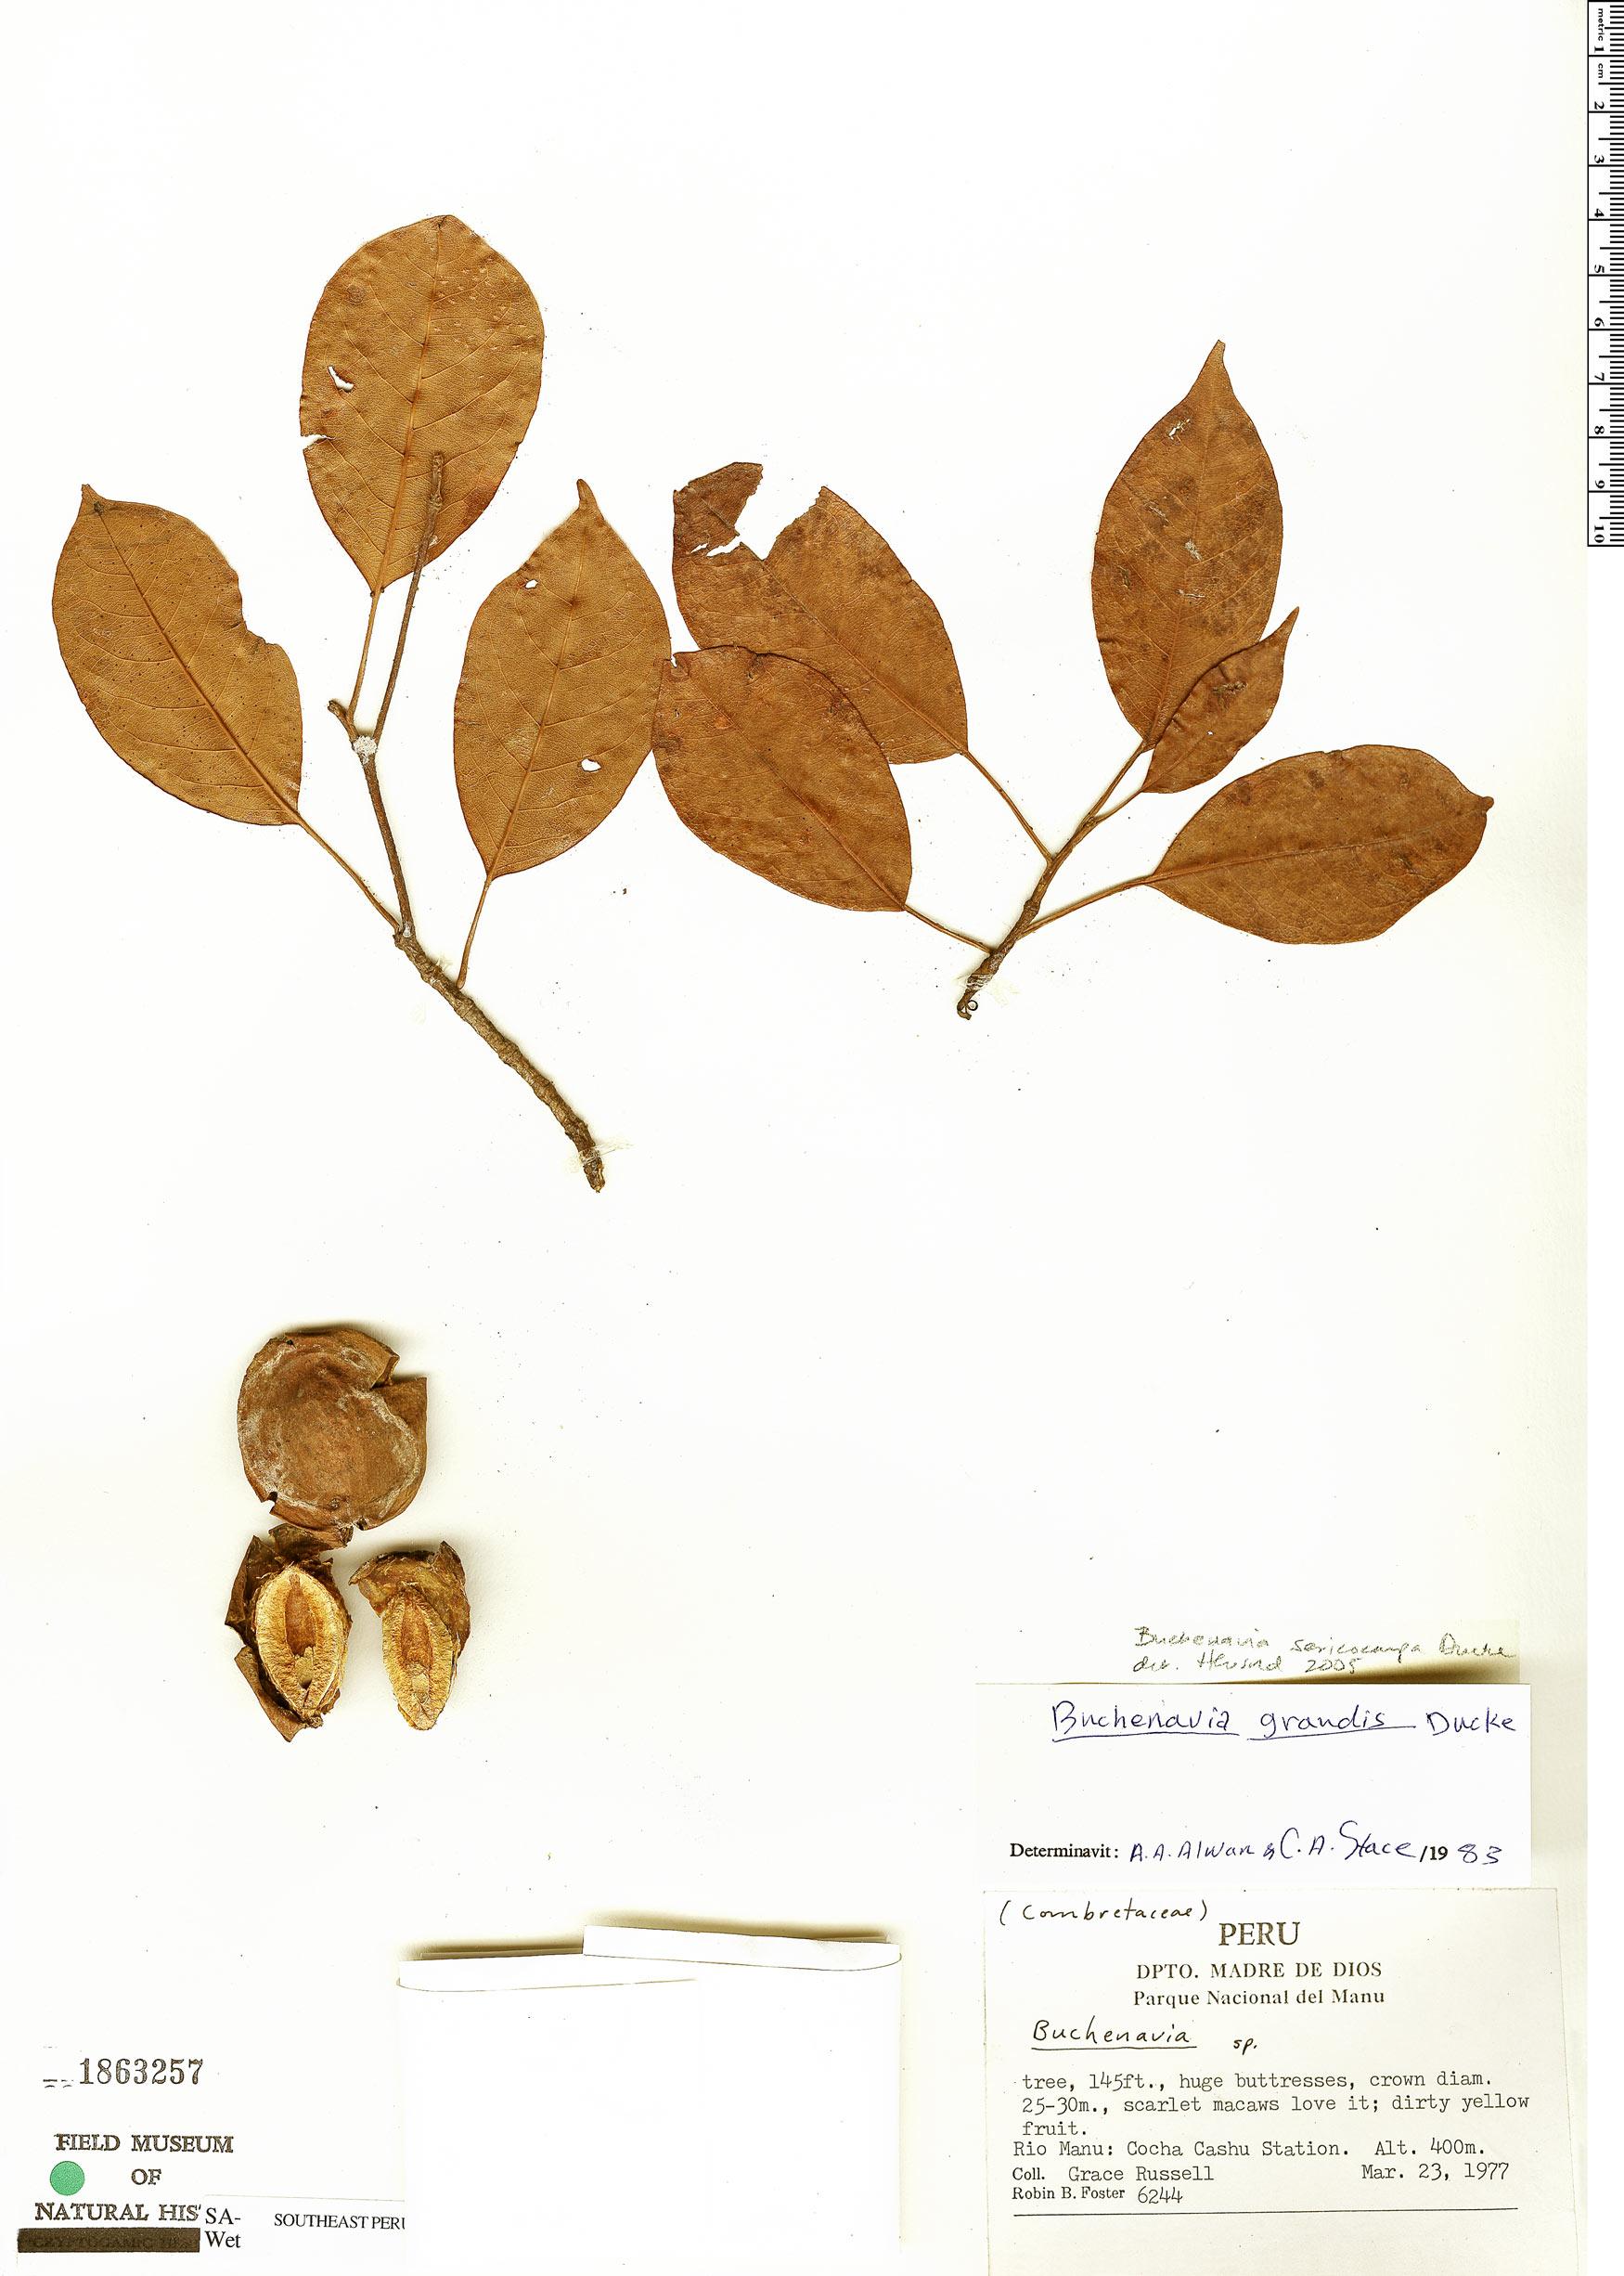 Specimen: Buchenavia sericocarpa